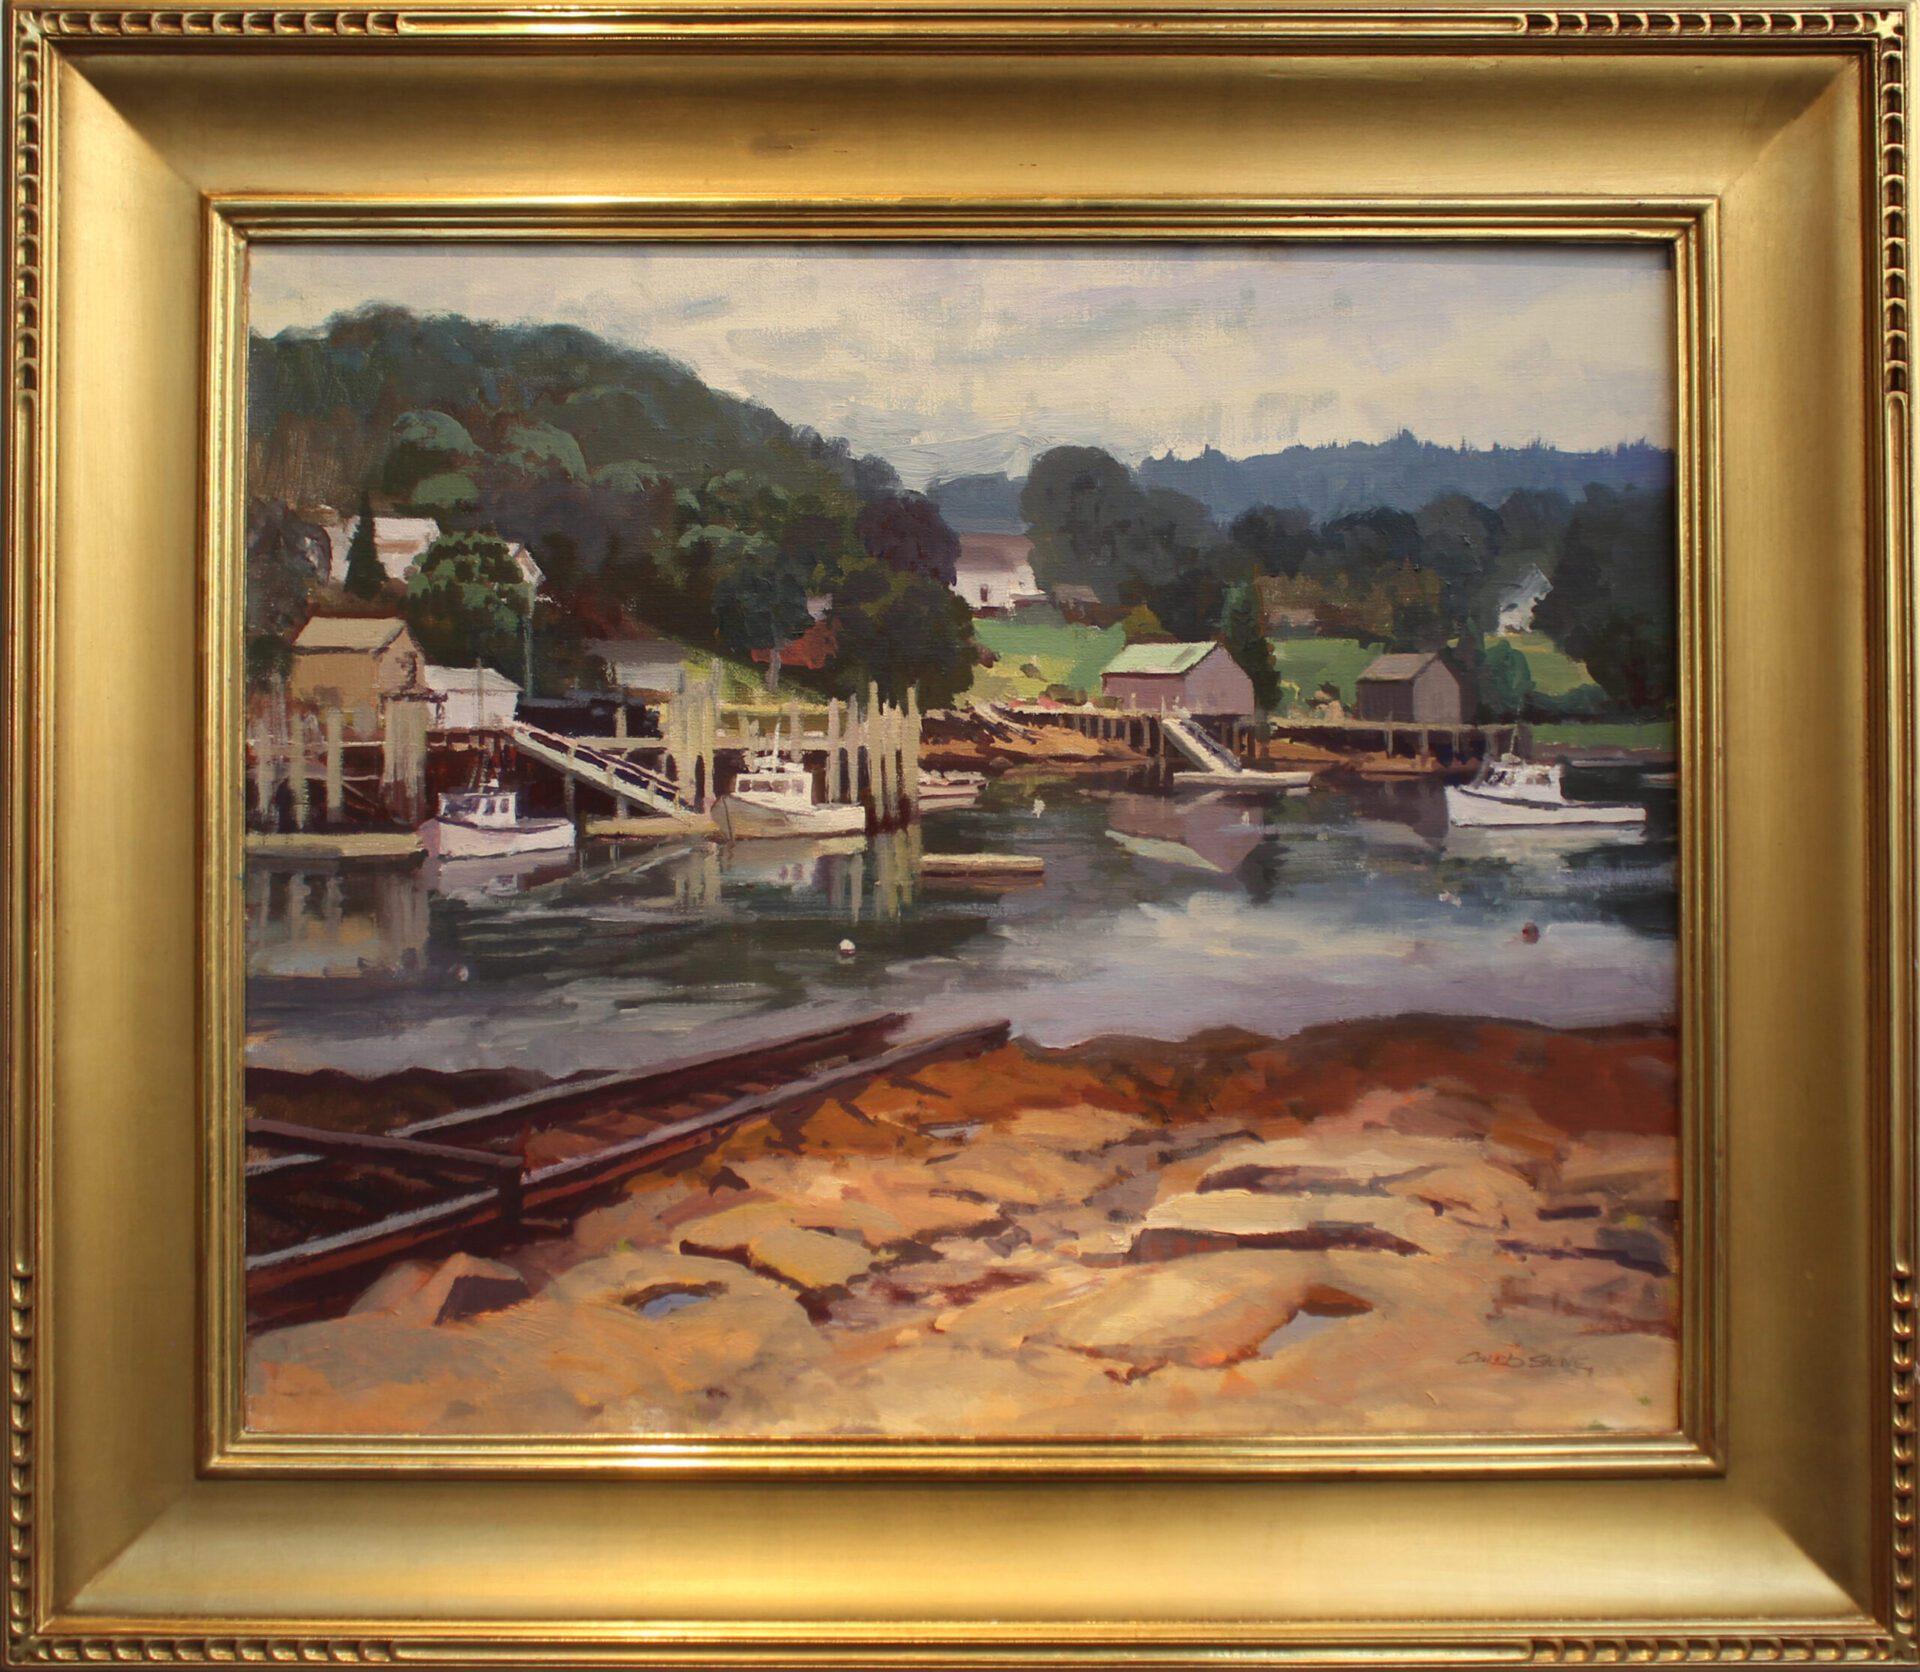 Stone_Caleb_Misty_Morning_Bristol_Harbor_20x24_Frame